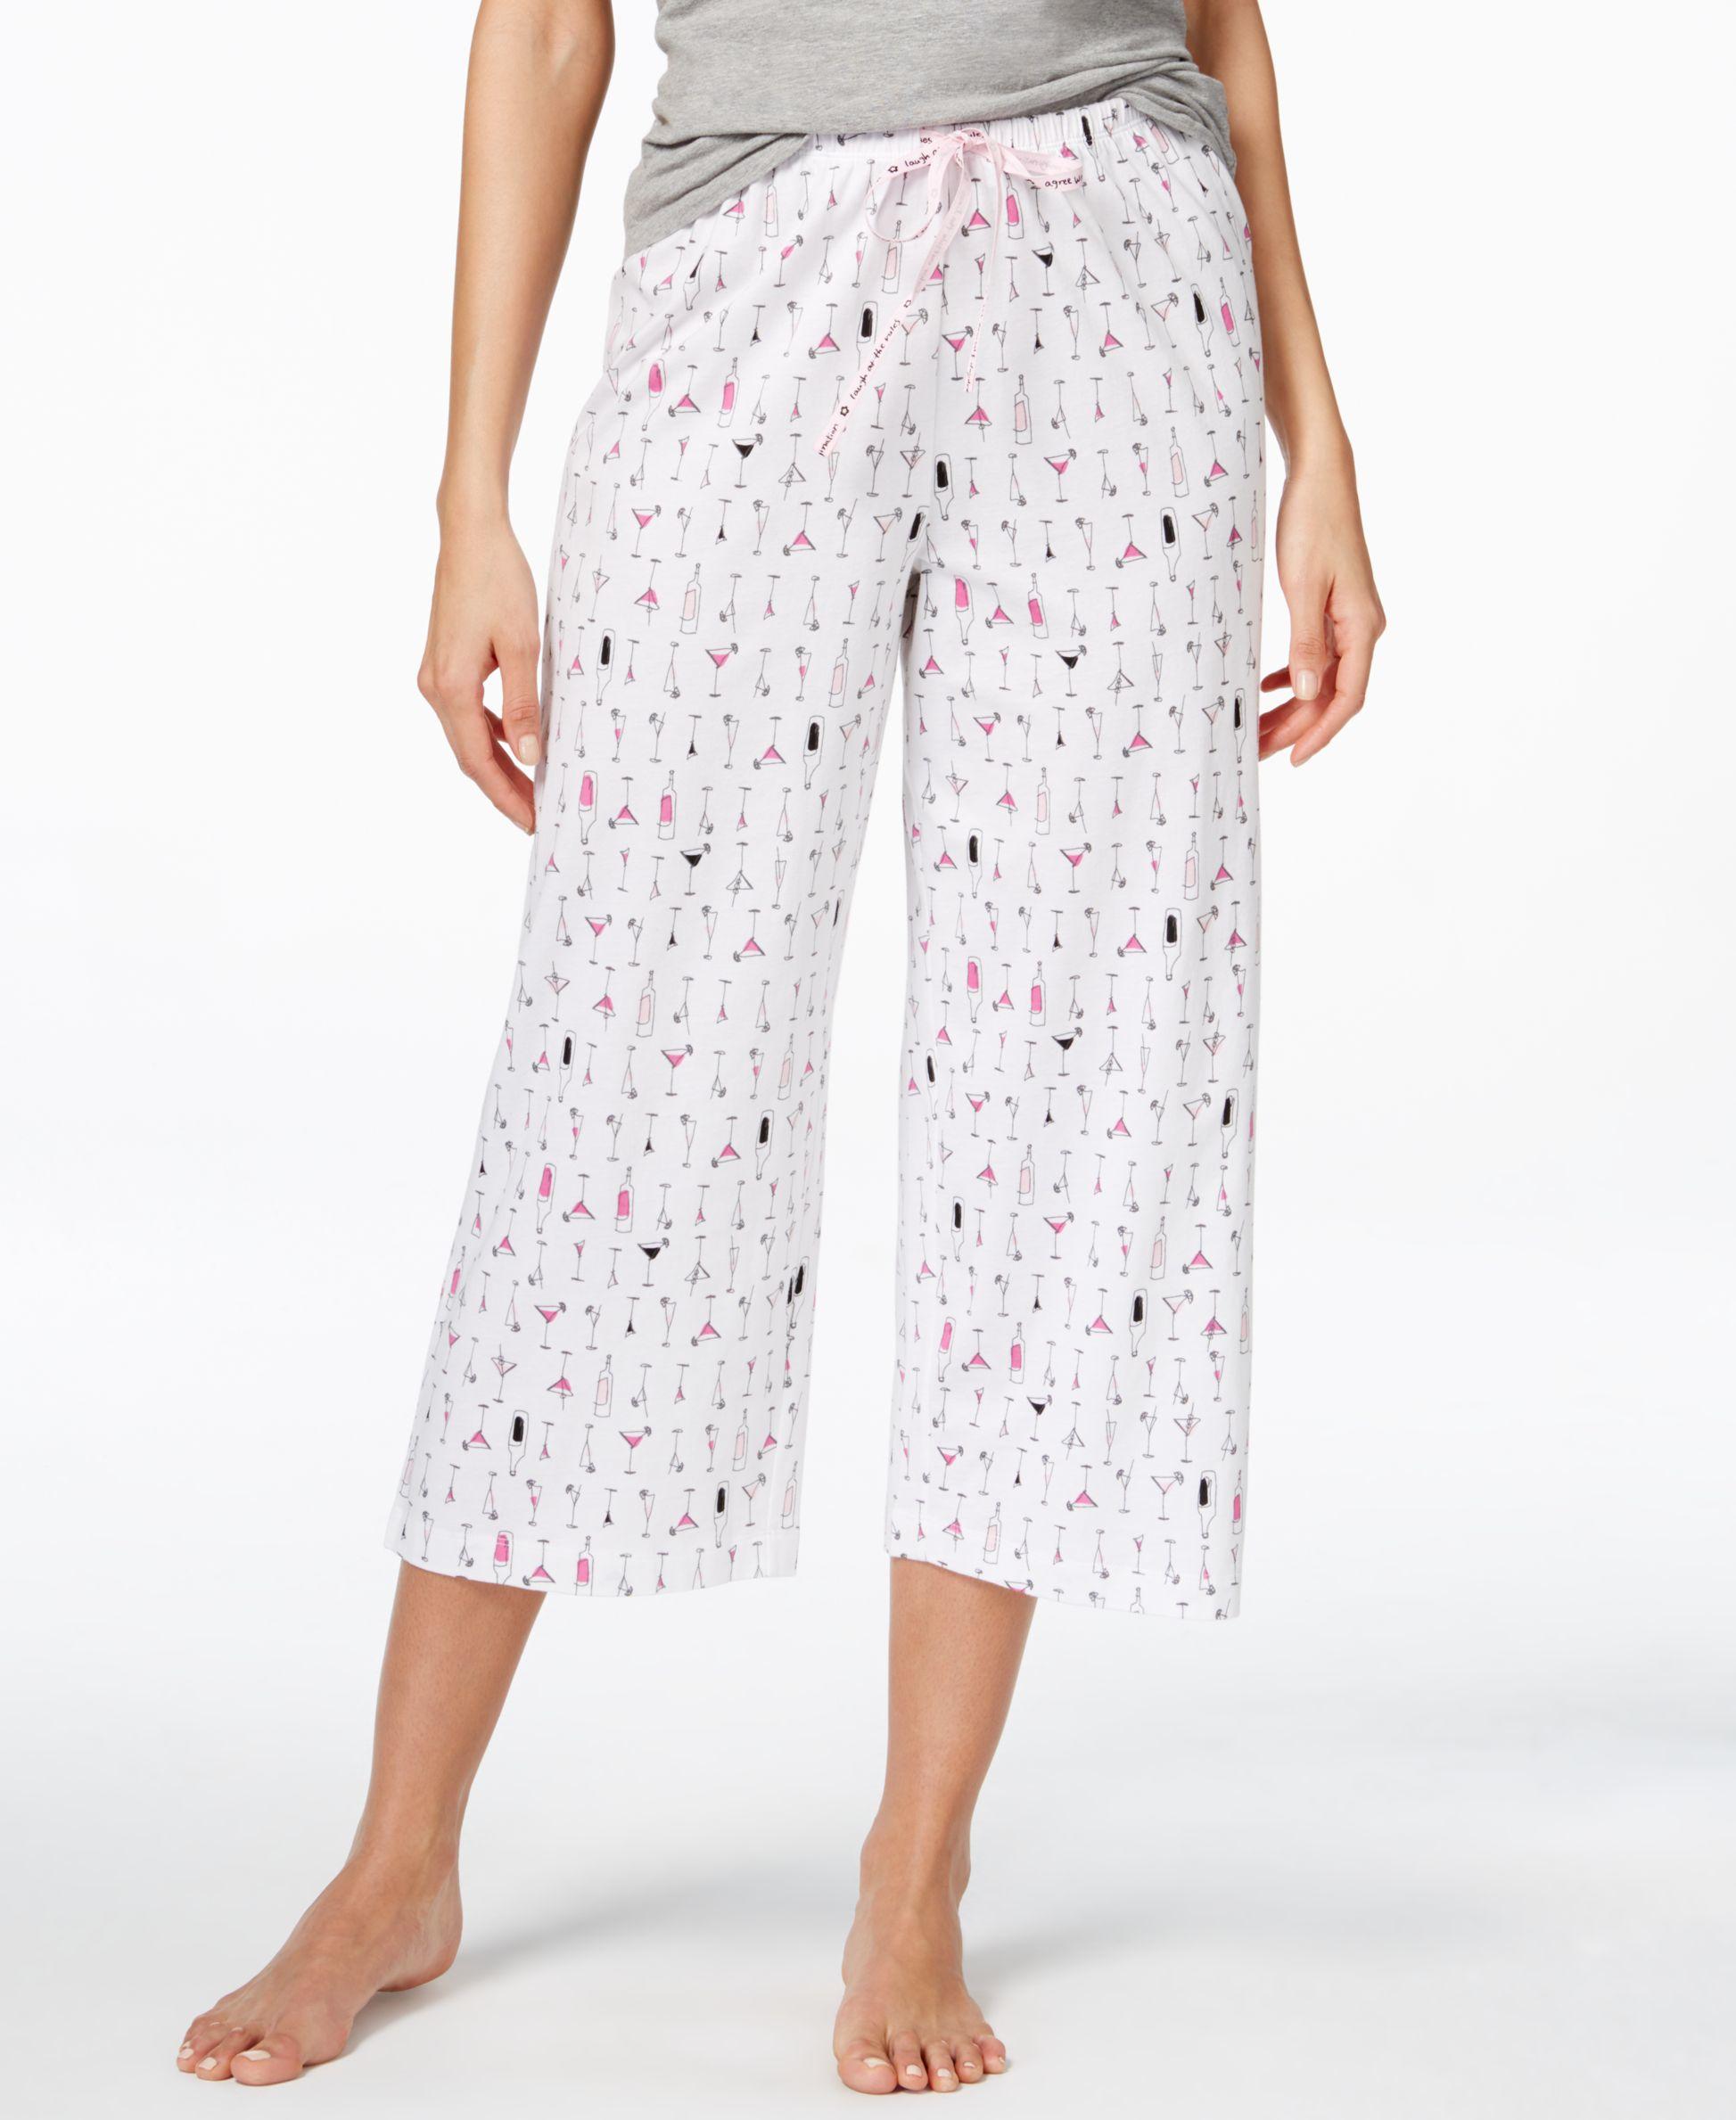 lyst hue cocktails print capri pajama pants in white. Black Bedroom Furniture Sets. Home Design Ideas